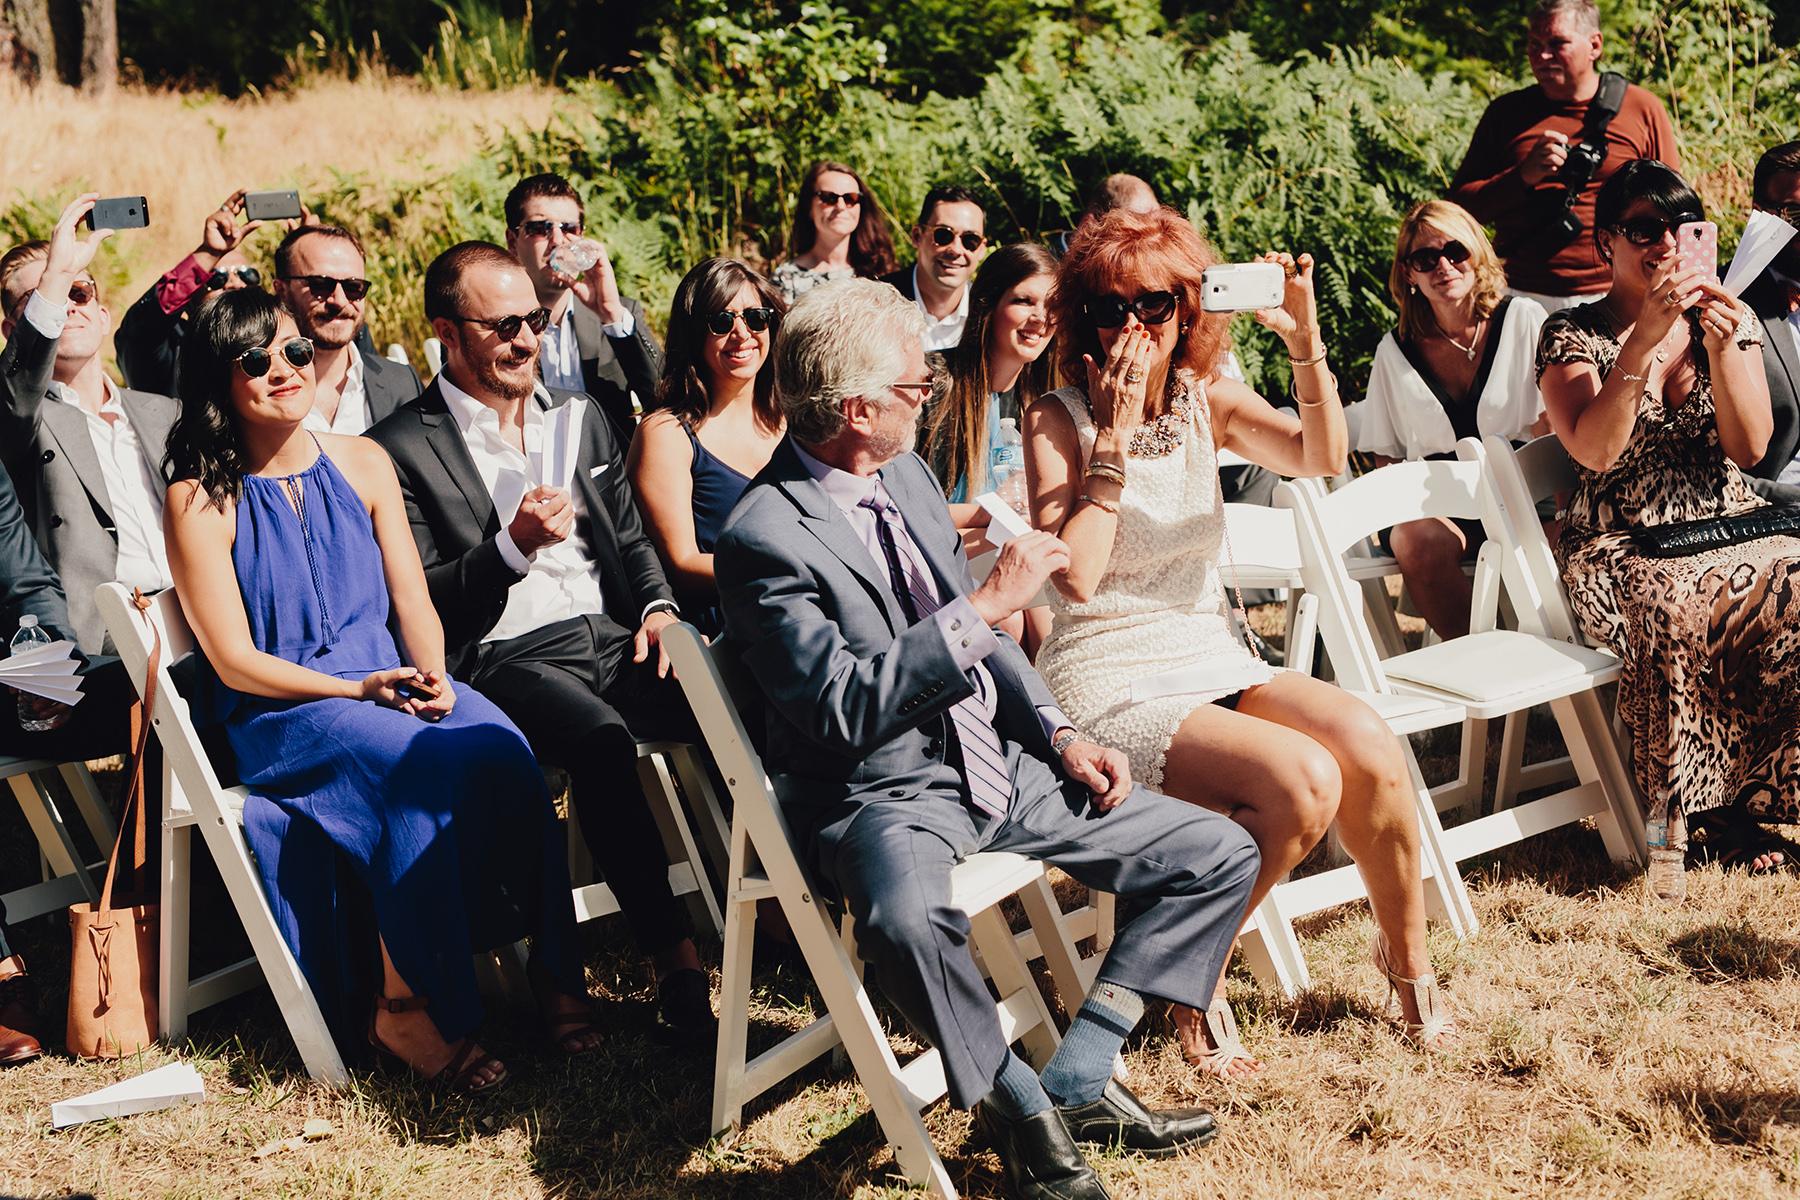 bodega-ridge-wedding-photos-0064.jpg